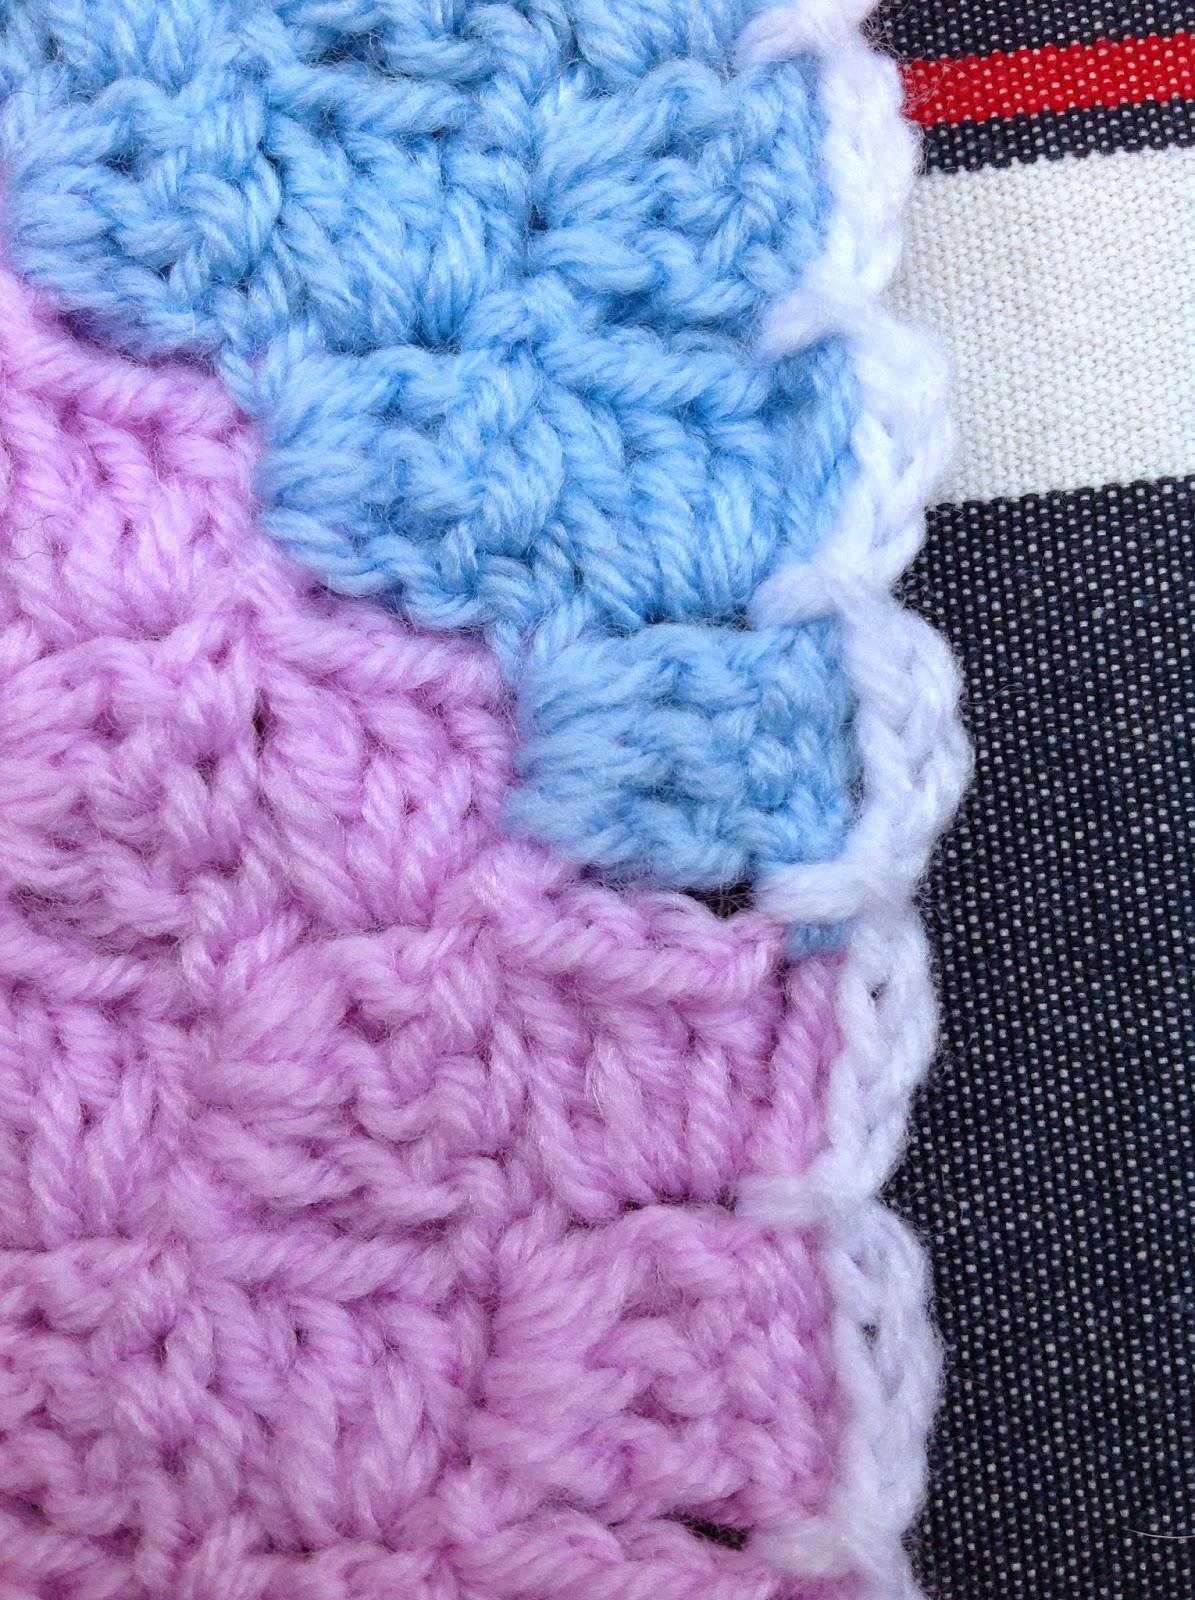 OYAs WORLD- Crochet-Knitting: Crochet: BOX STITCH - Diagonal or Straight.